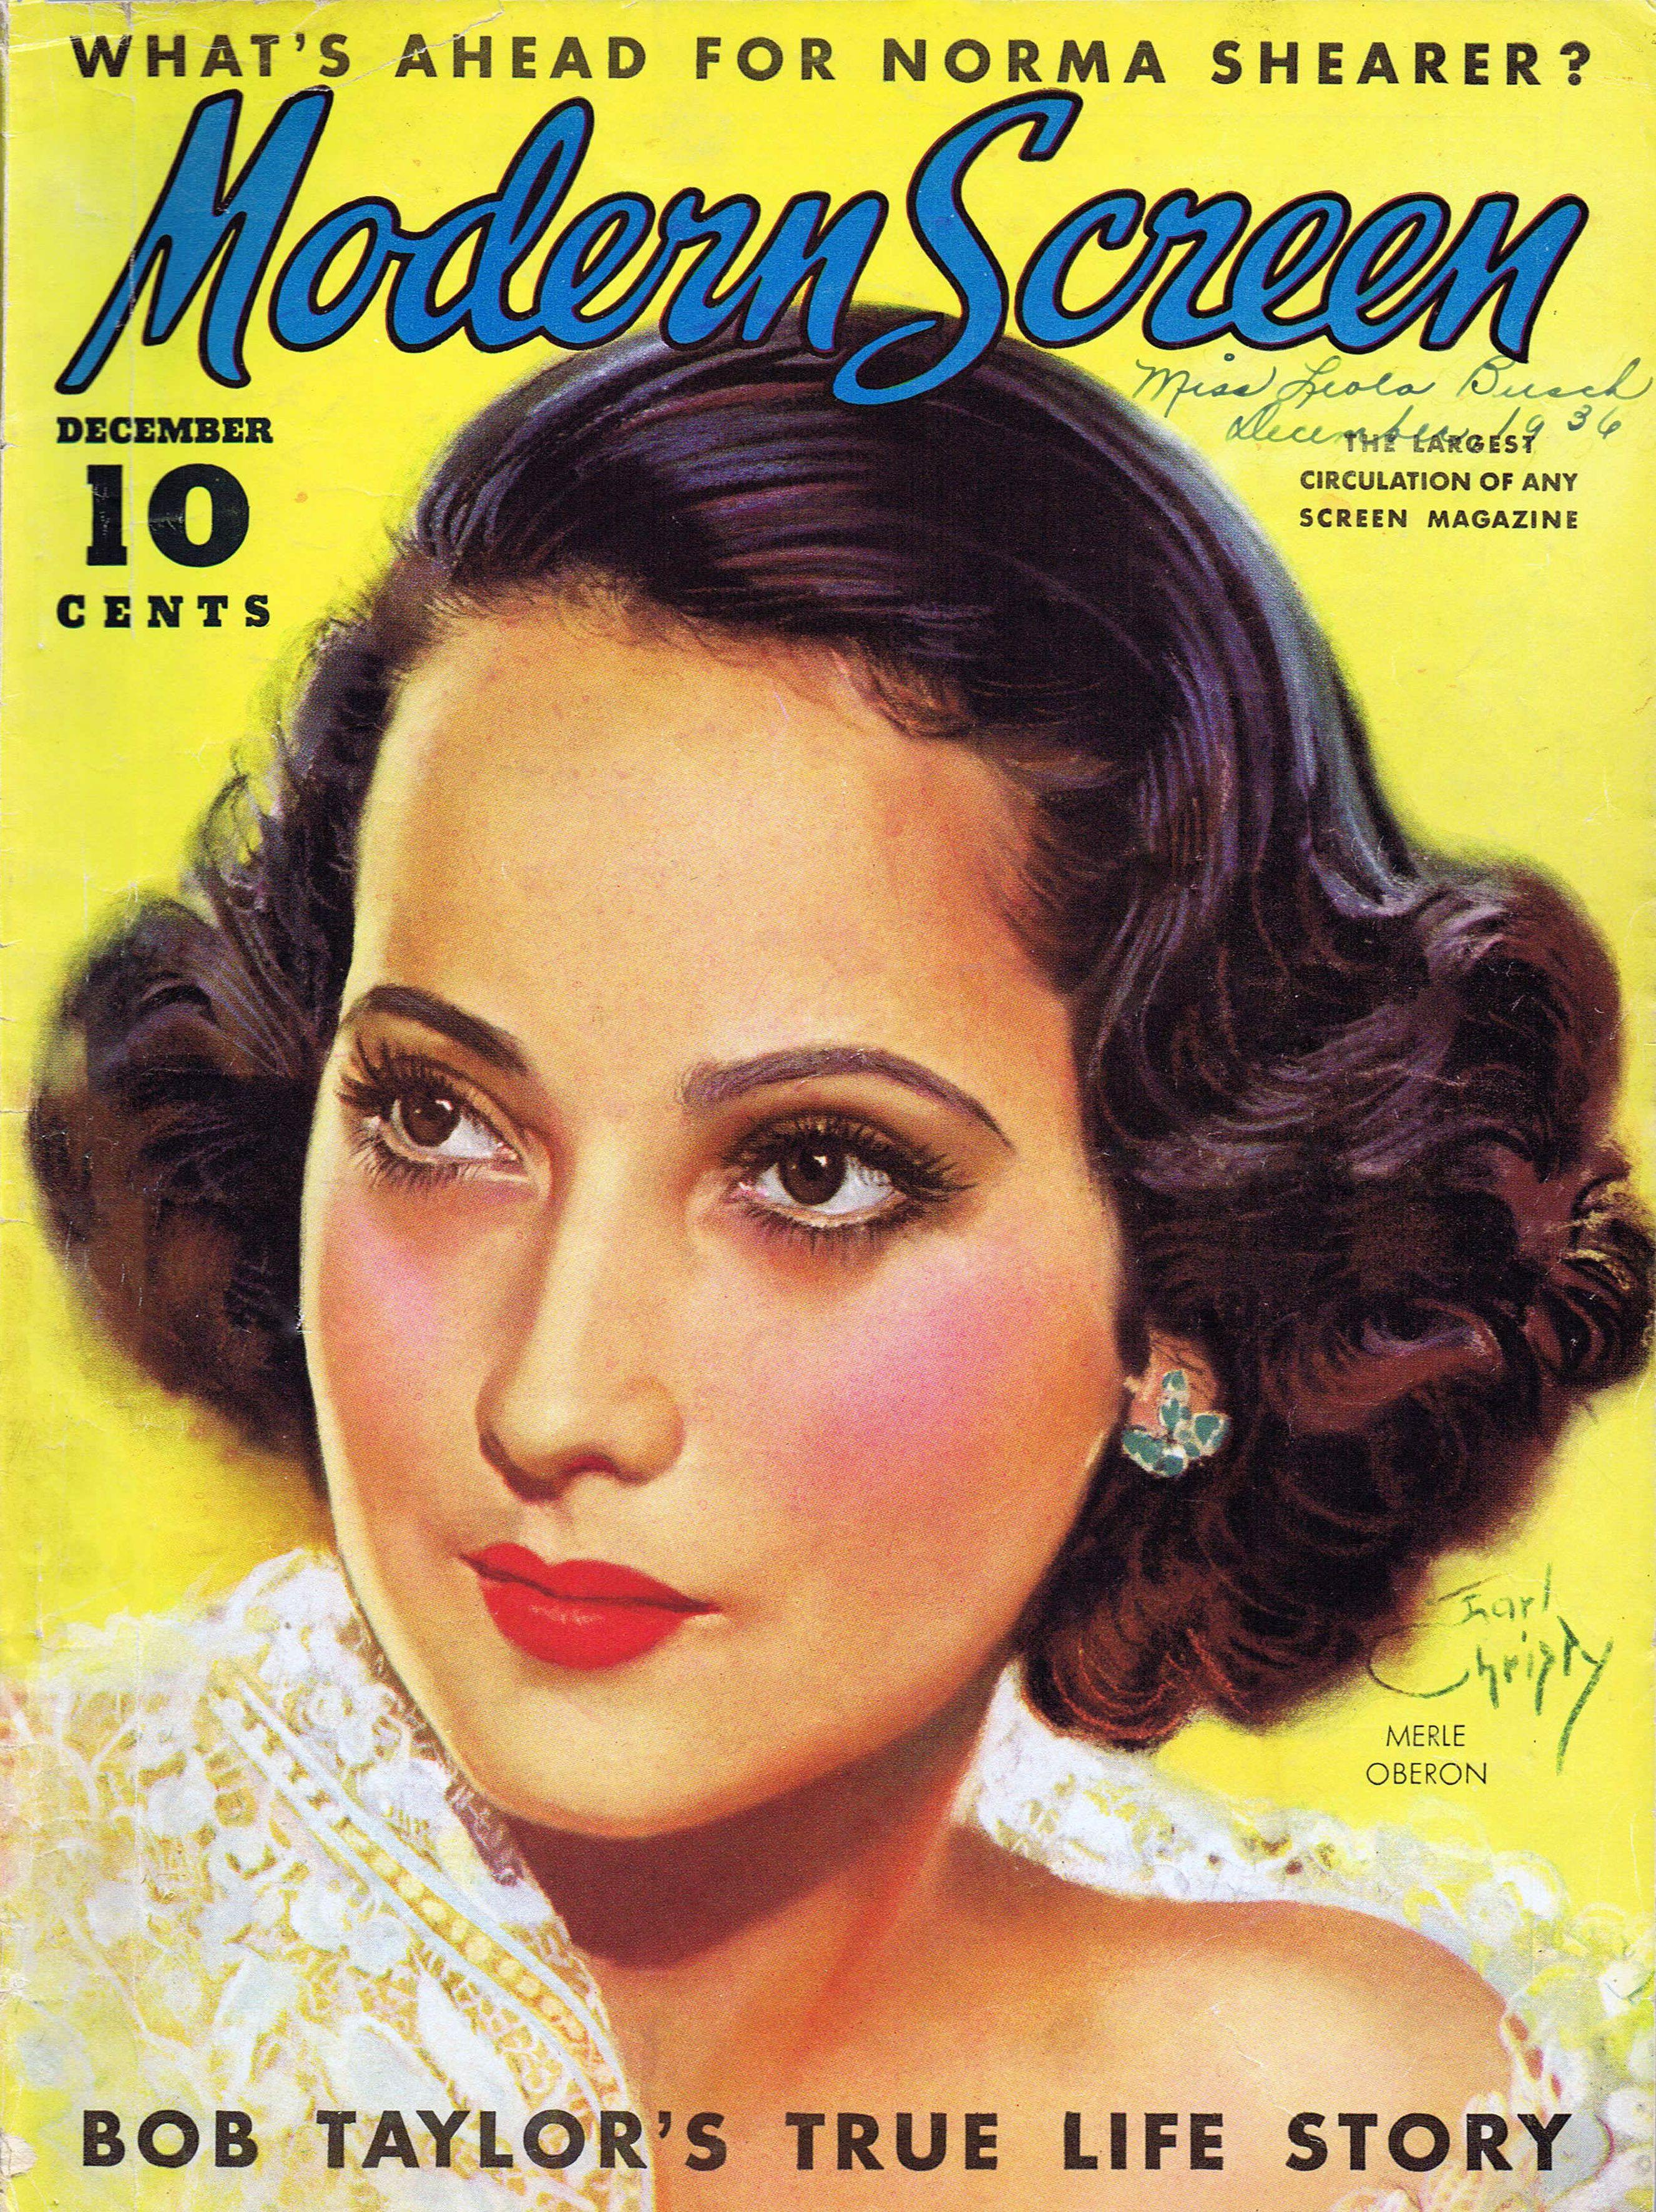 Modern Screen, December 1936 : Merle Oberon